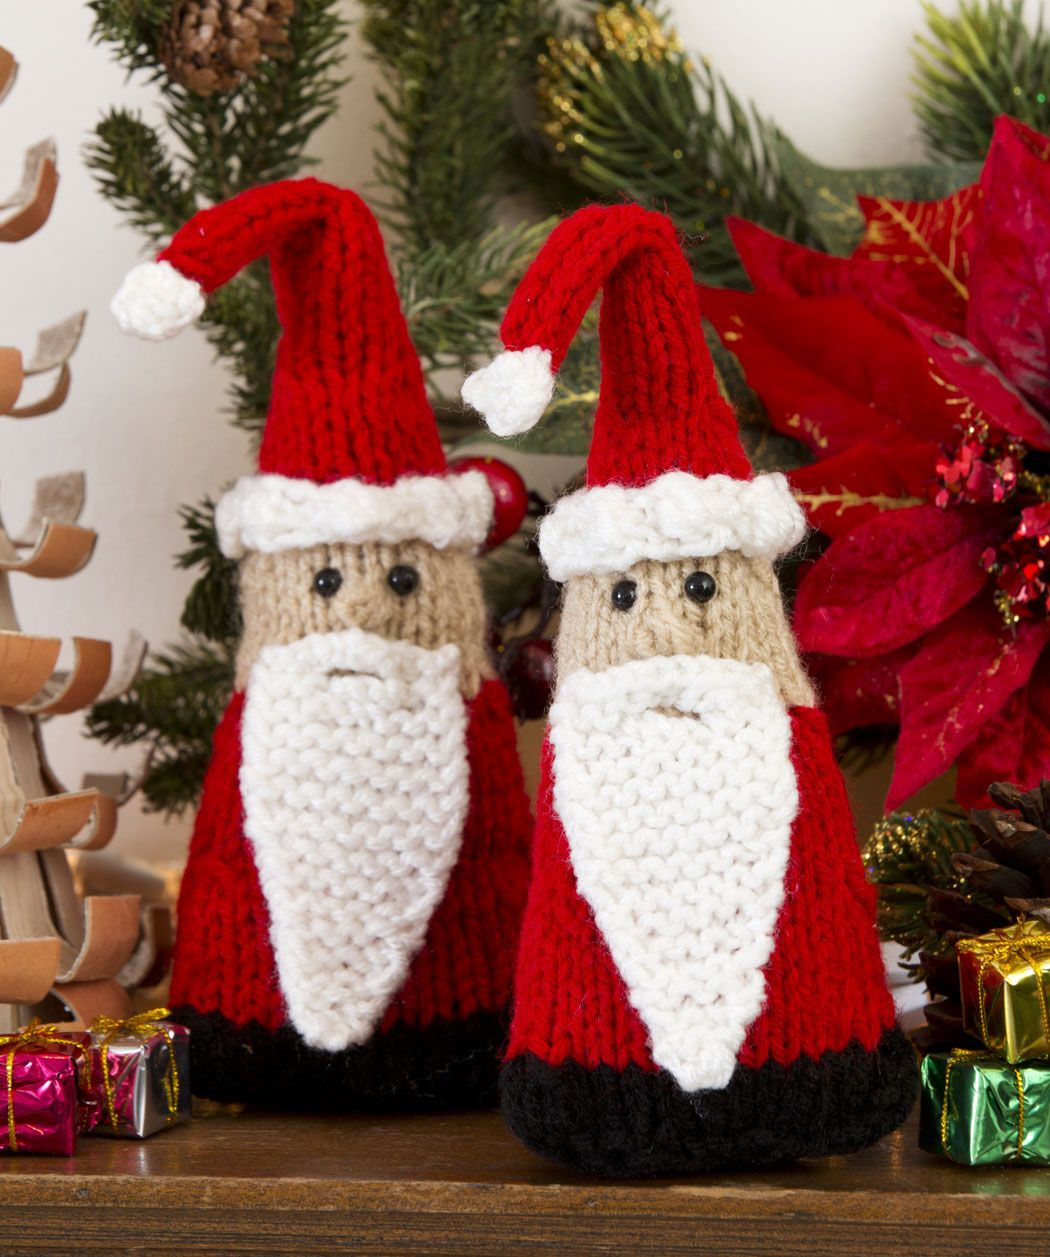 Santa Gnome Ornaments Knitting Pattern from Red Heart yarns ...